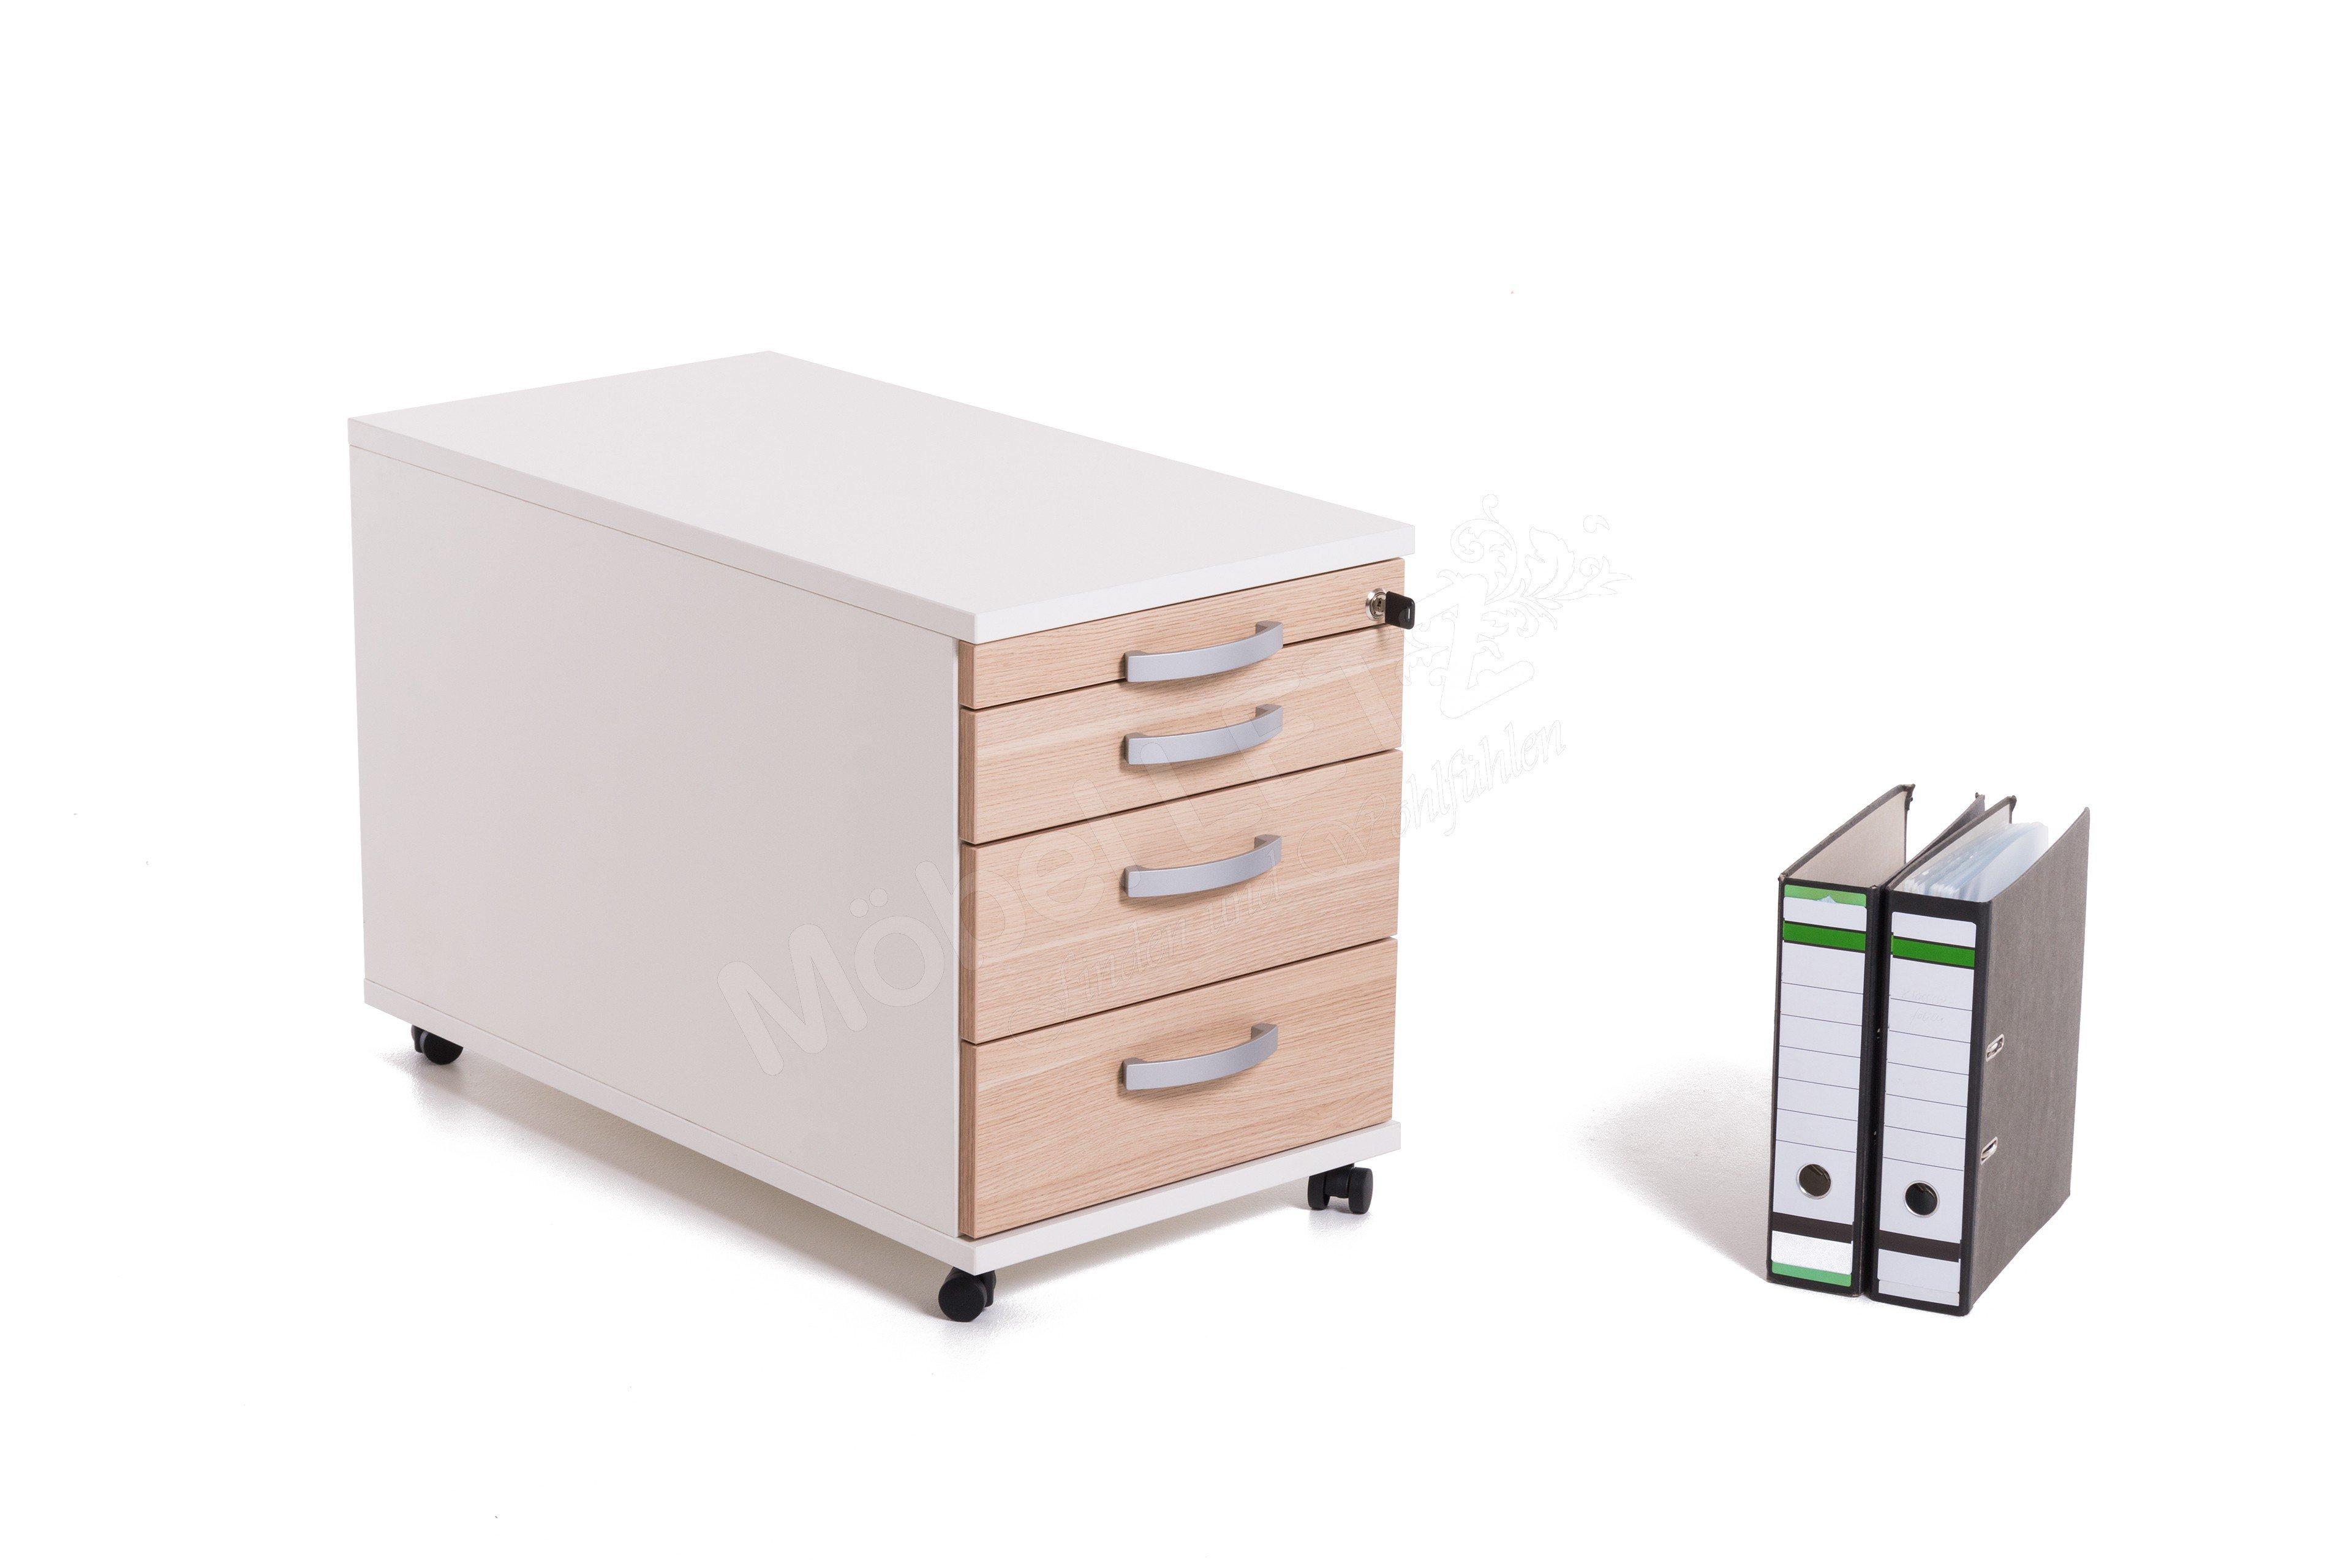 Röhr-Bush Büromöbel | Möbel Letz - Ihr Online-Shop